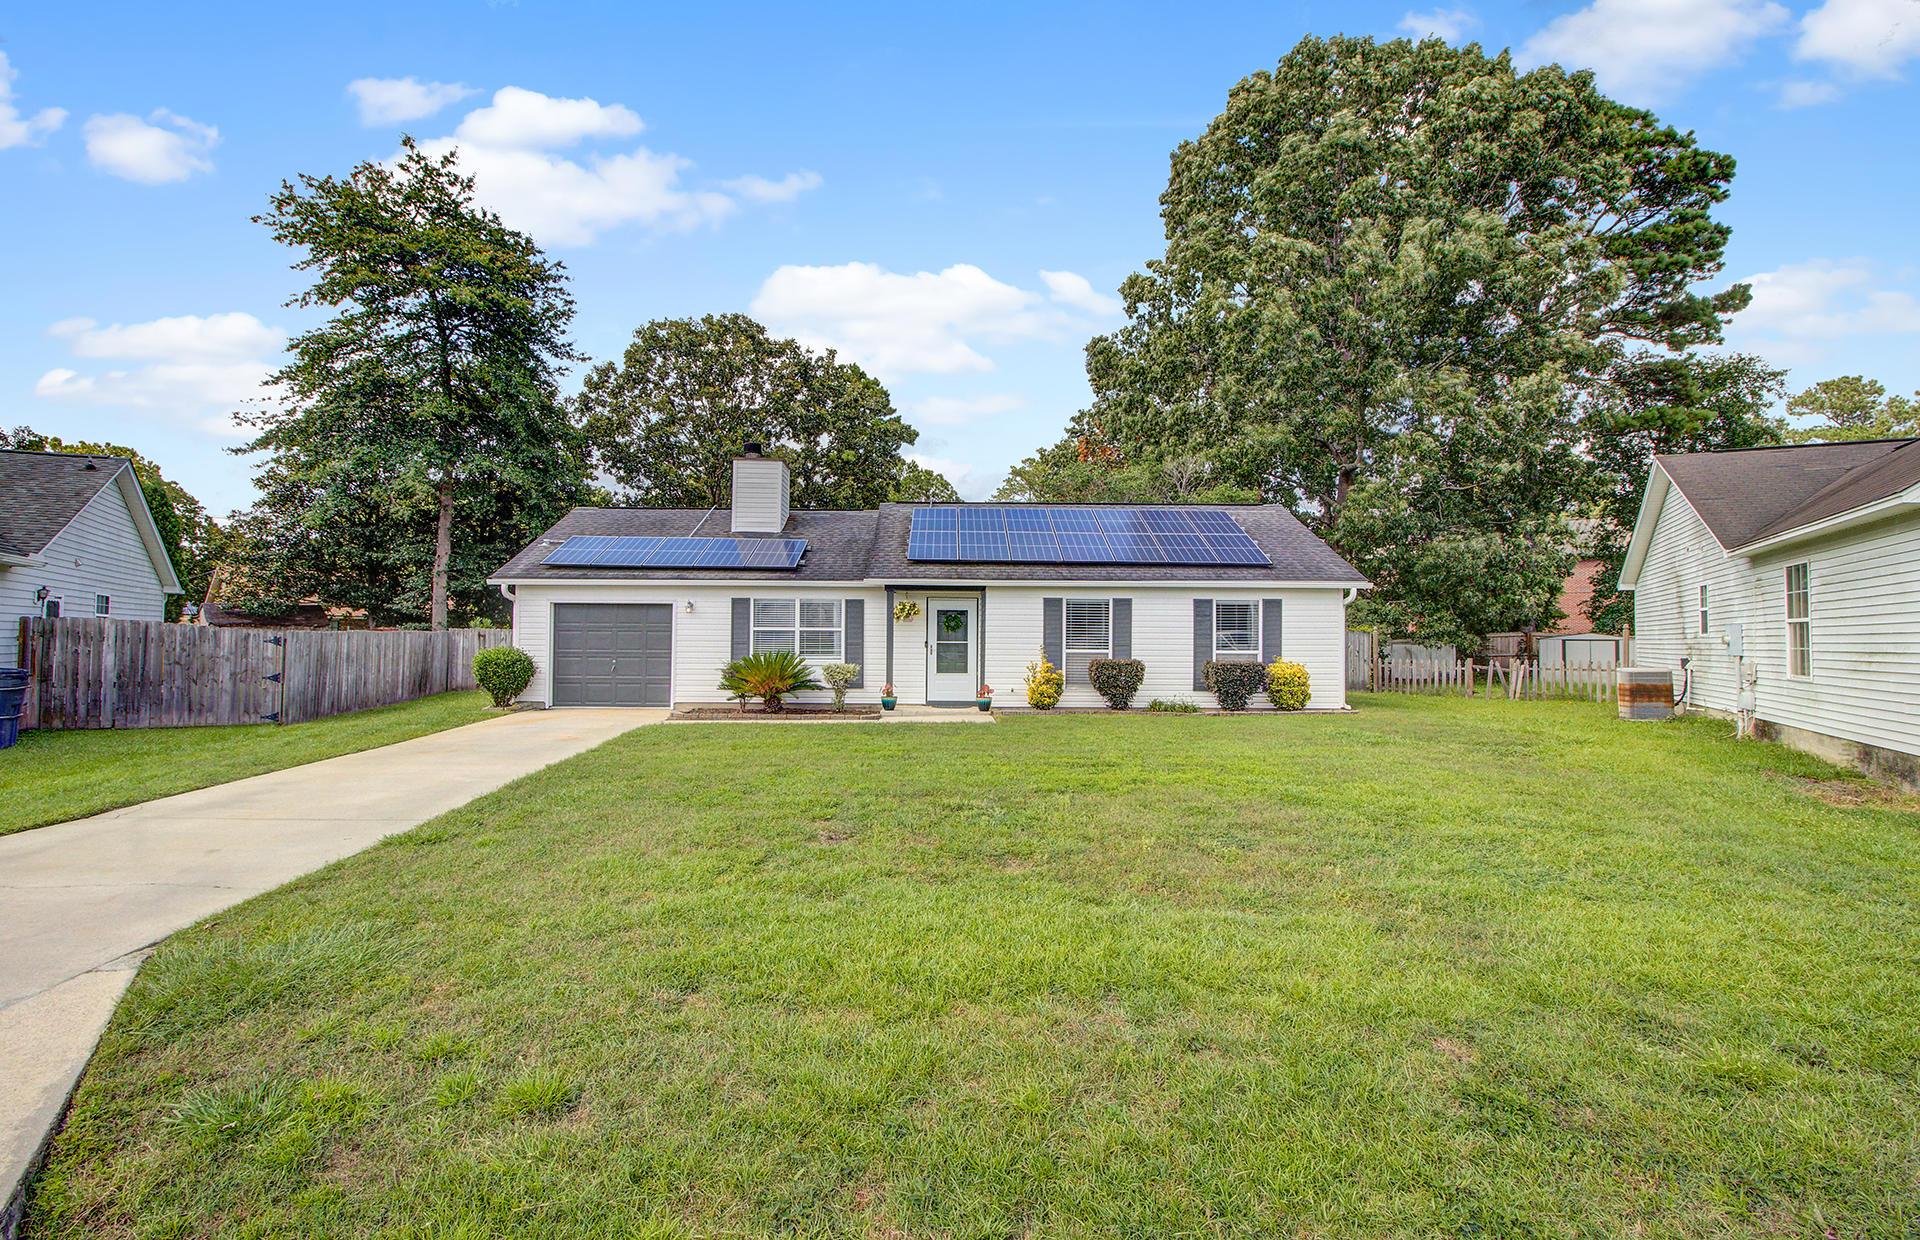 Reindeer Woods Homes For Sale - 2760 Donner, North Charleston, SC - 12